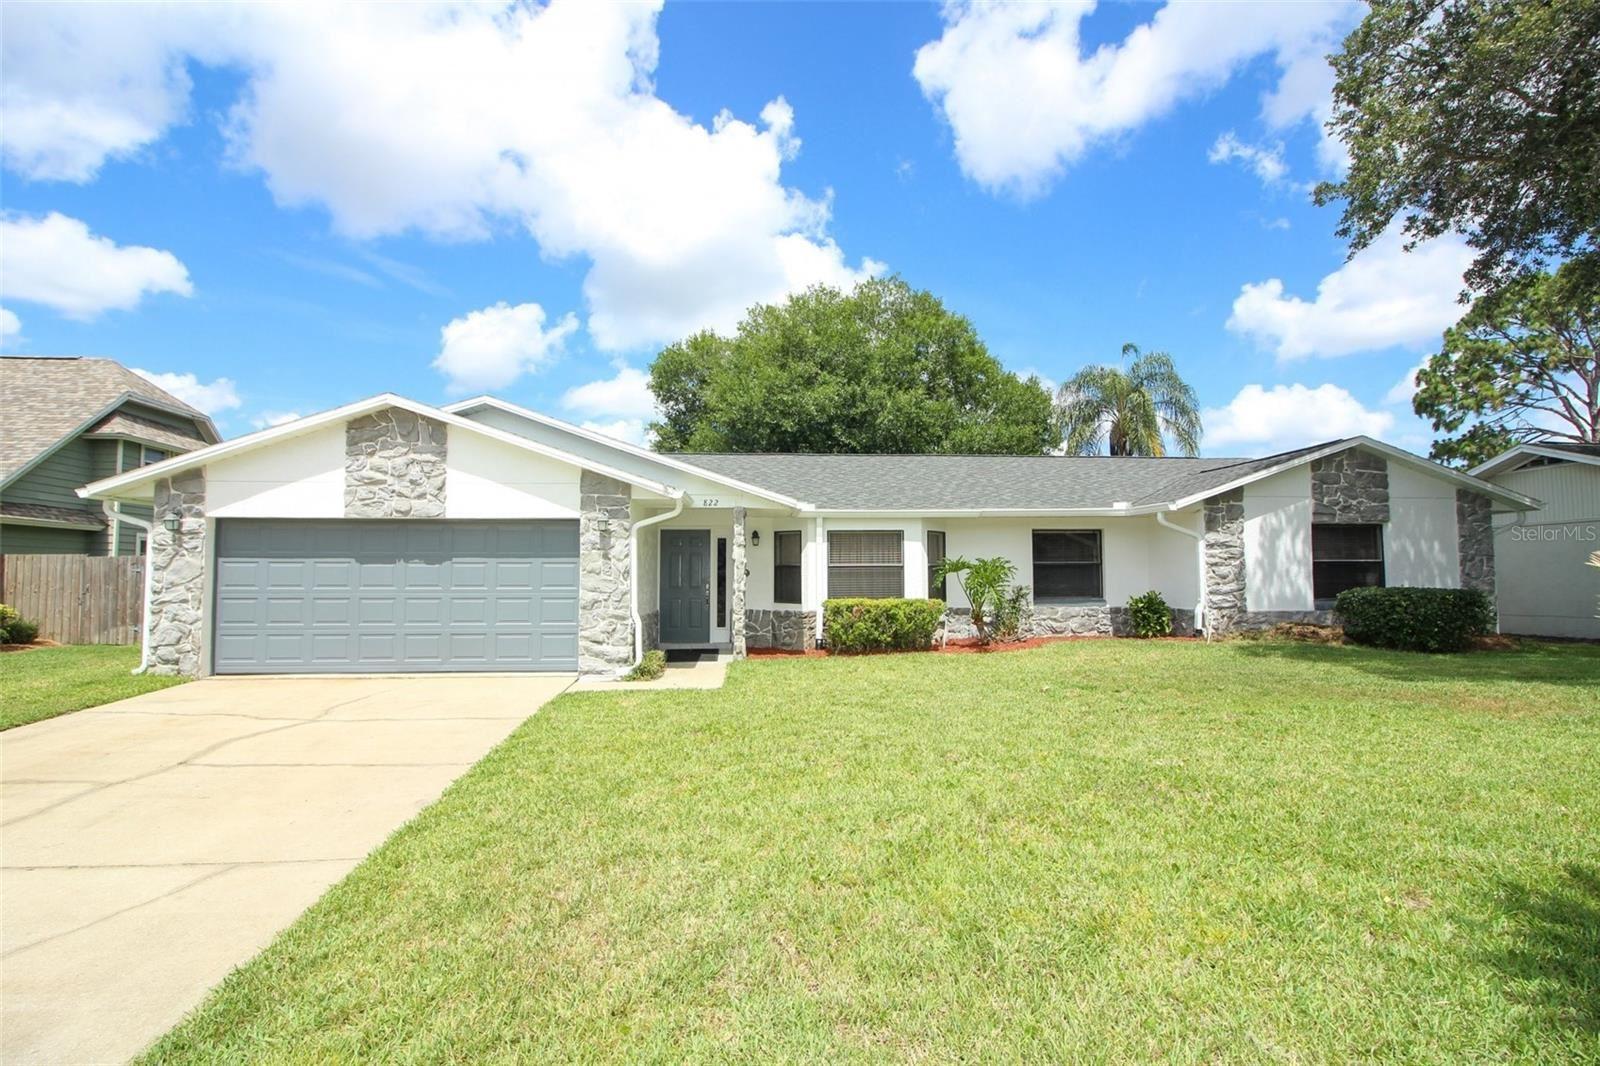 822 PINE MEADOWS RD, Orlando, FL 32825 - MLS#: O5950506